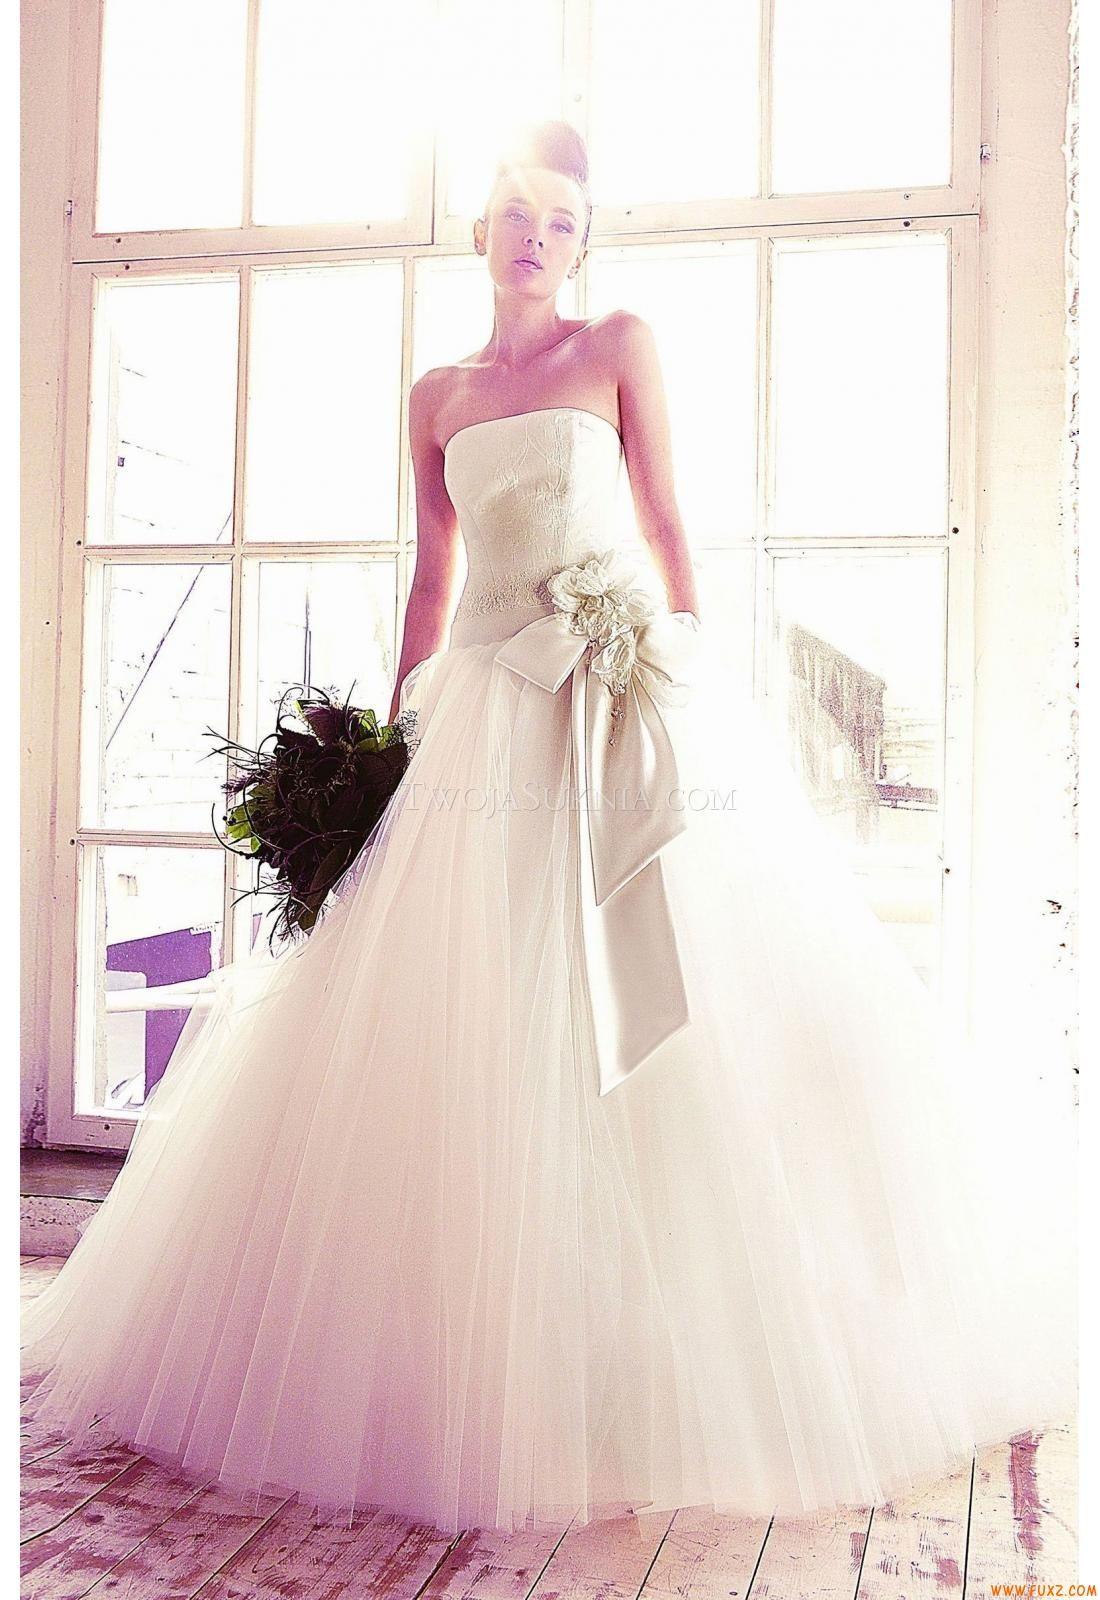 Wedding Dresses Le Rina Iveta Lux 2012 Wedding dresses